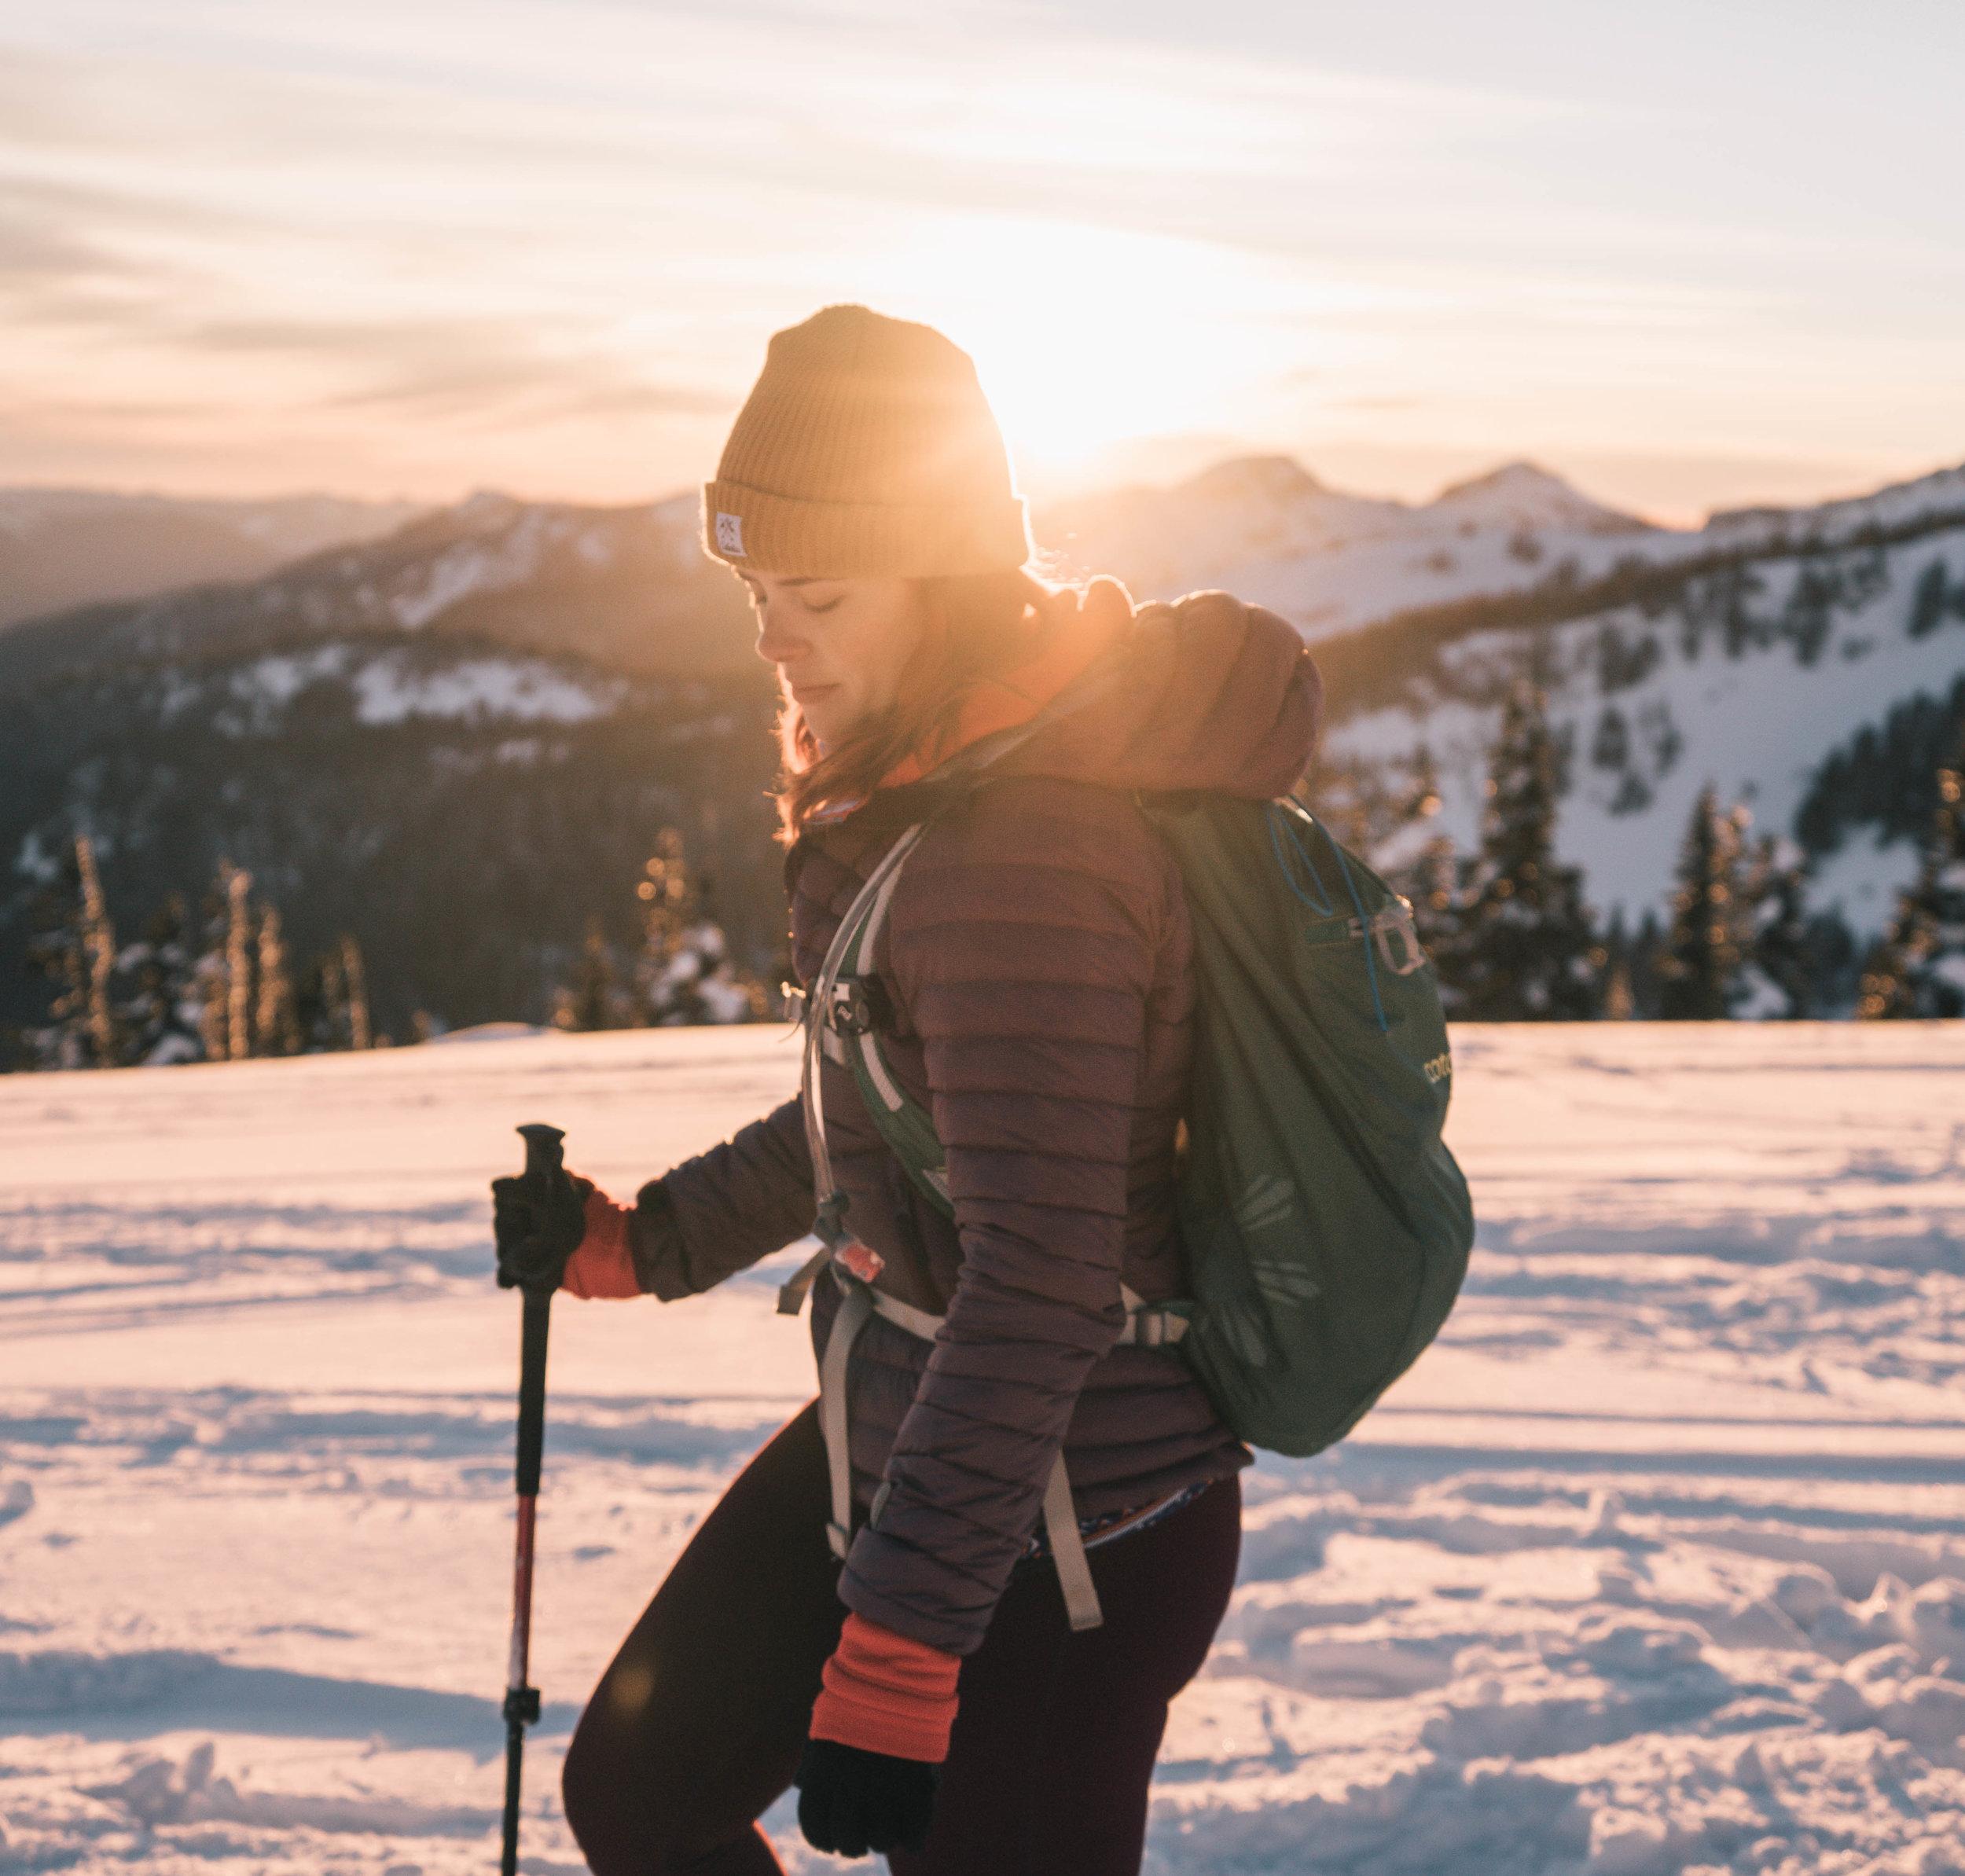 Snow-Camping-at-Mount-Rainier-National-Park-1.jpg